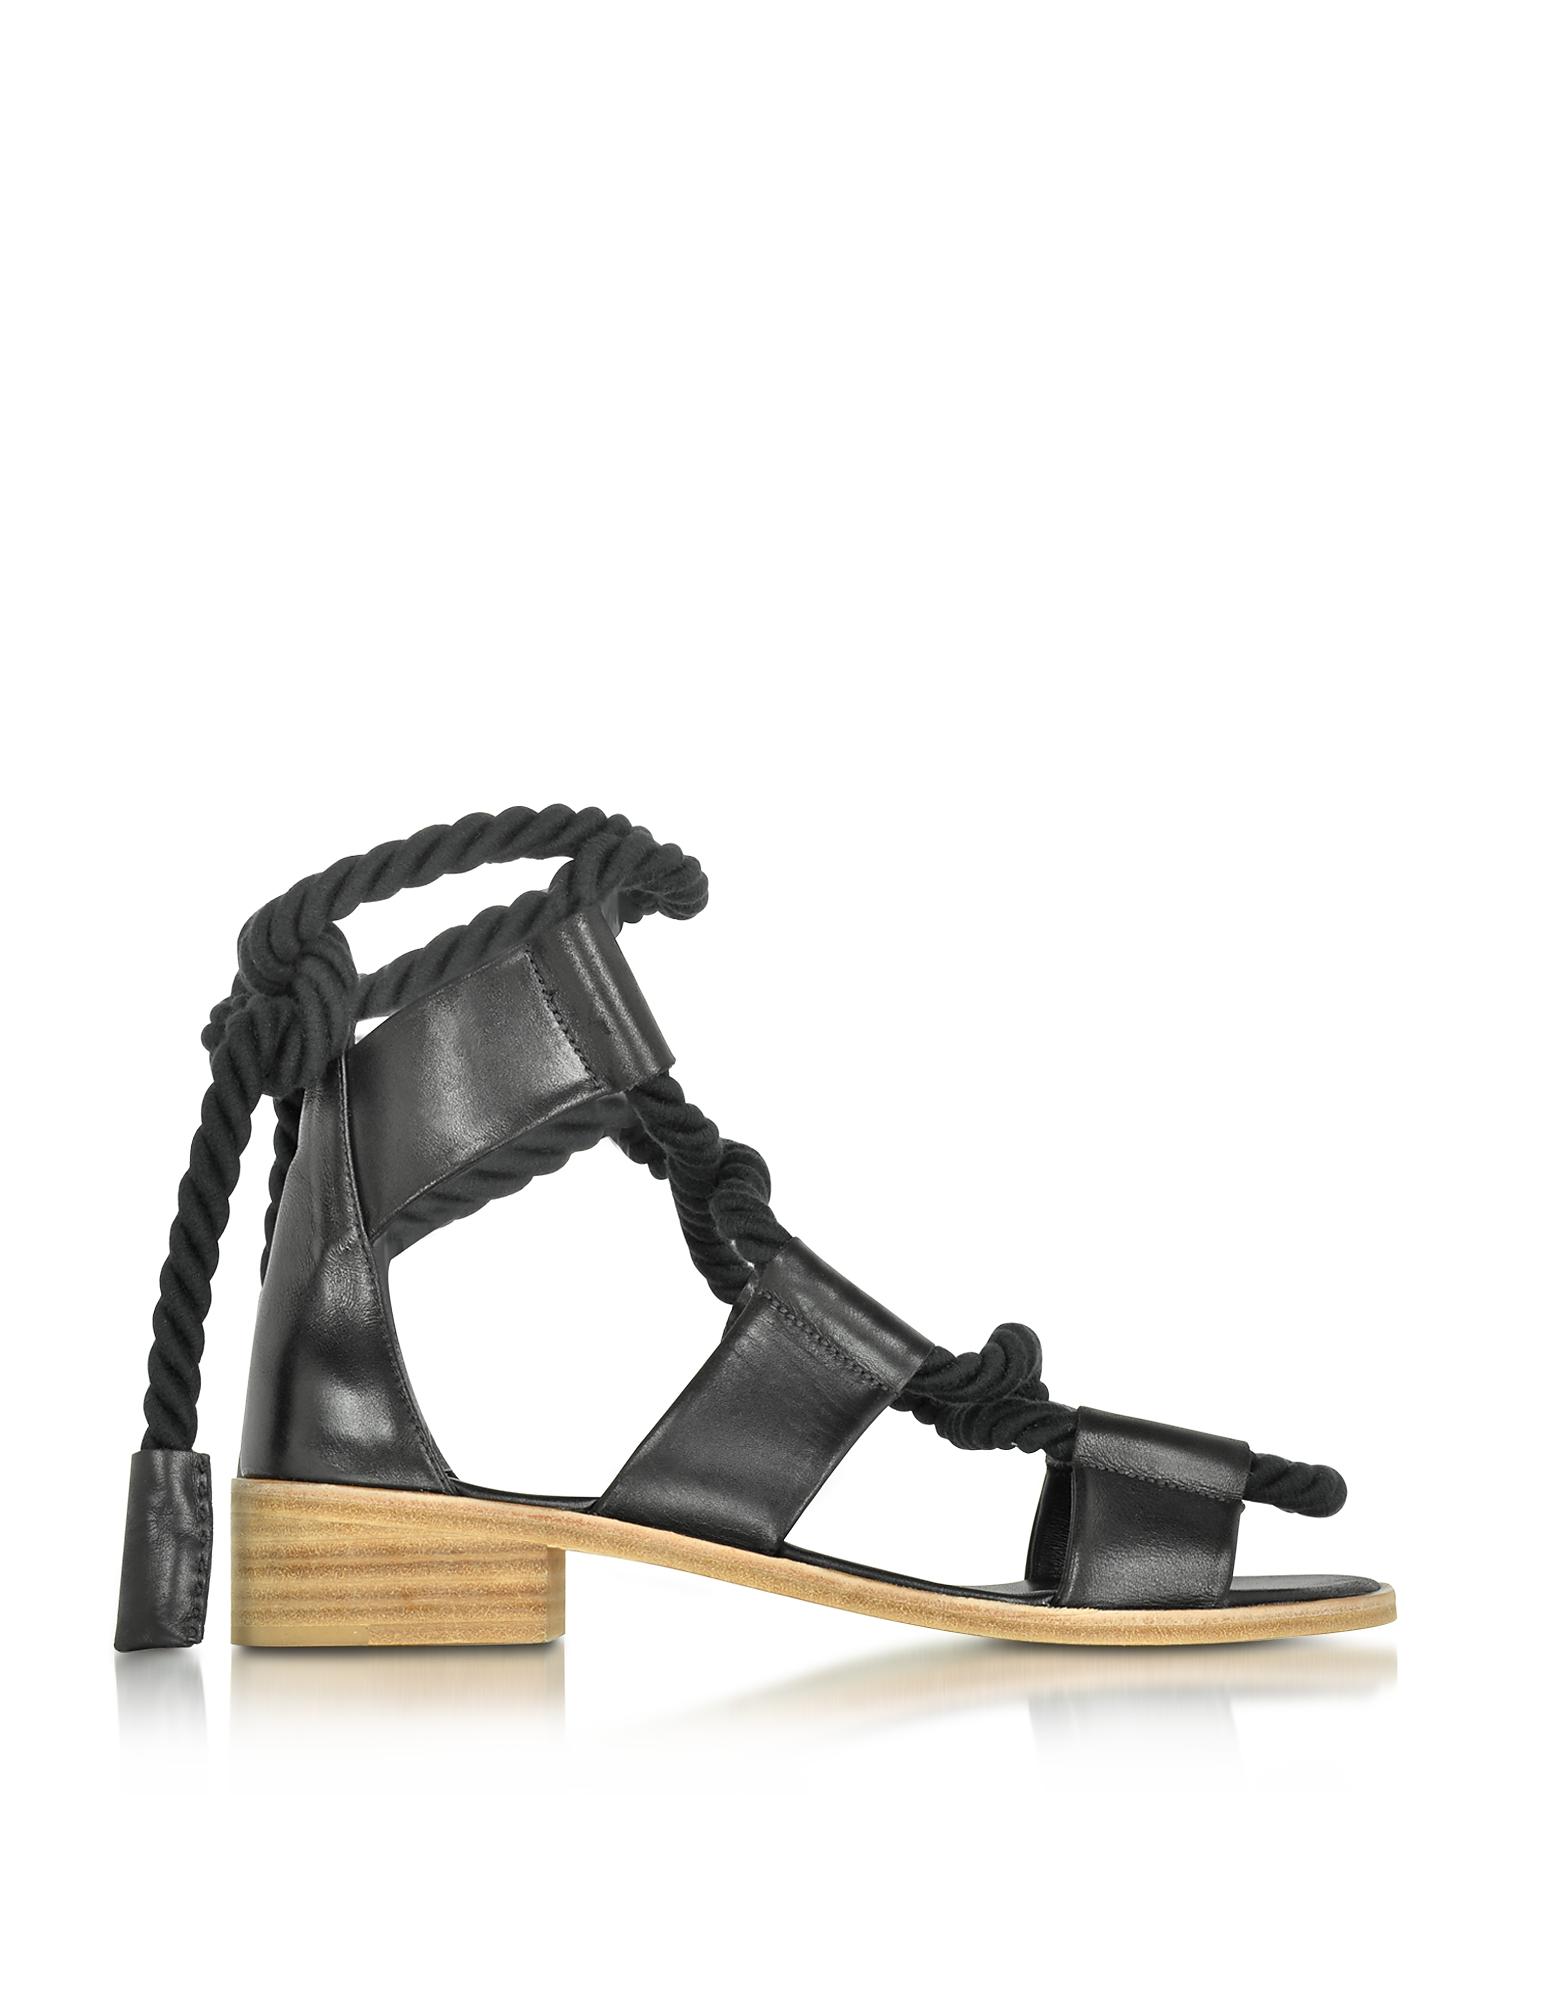 Pierre Hardy Shoes, Azur Black Leather Sandal